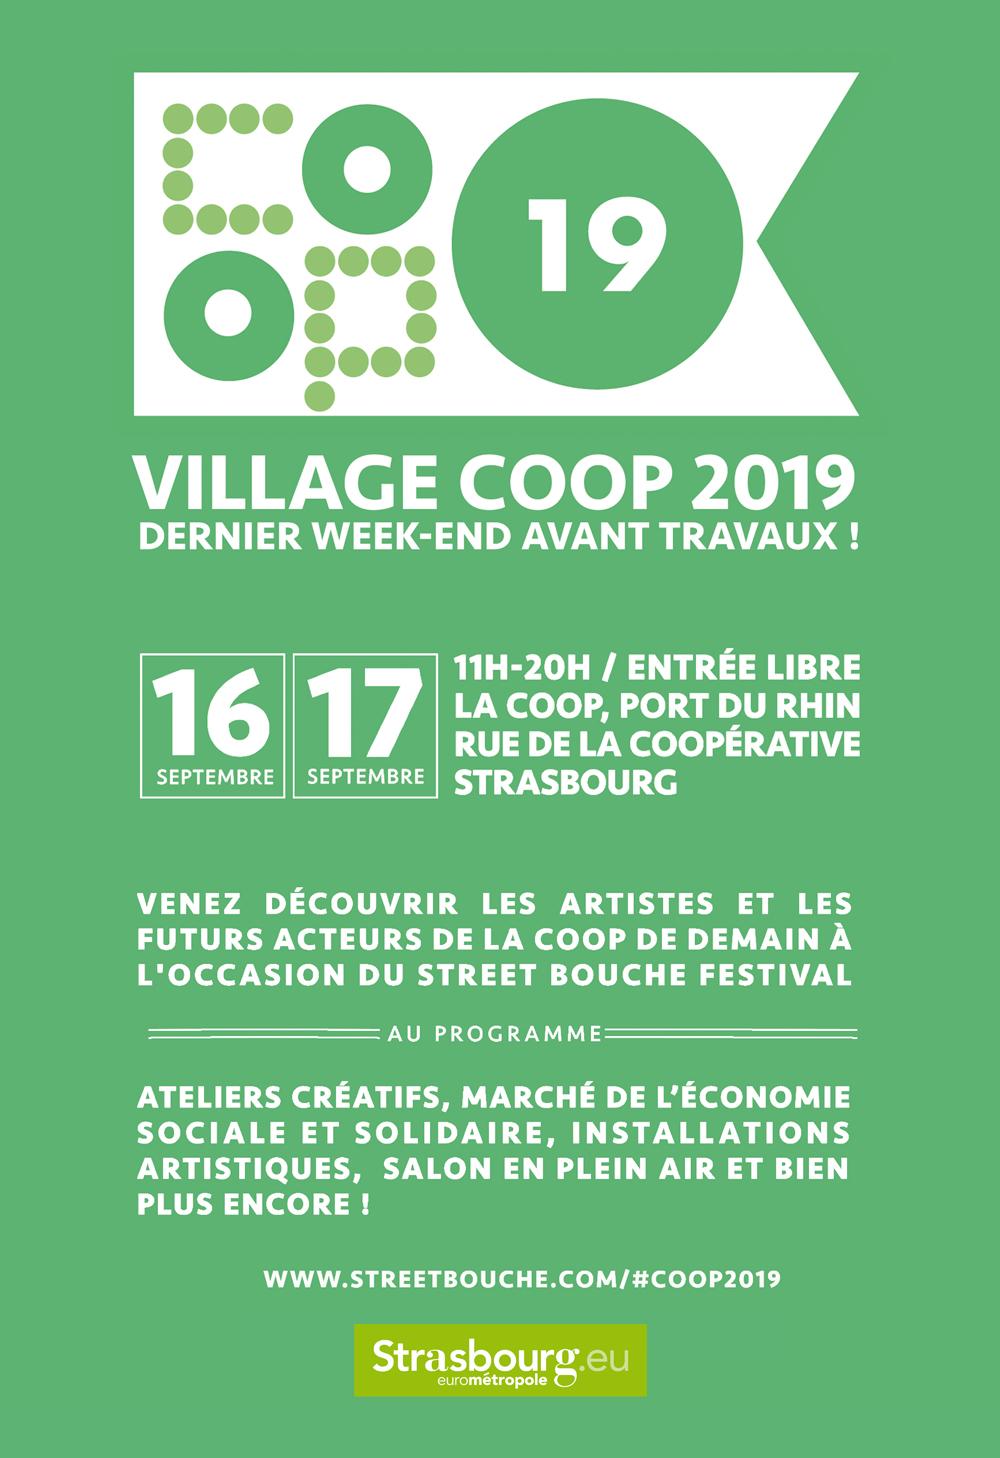 Village Coop 2019 Street Bouche Festival